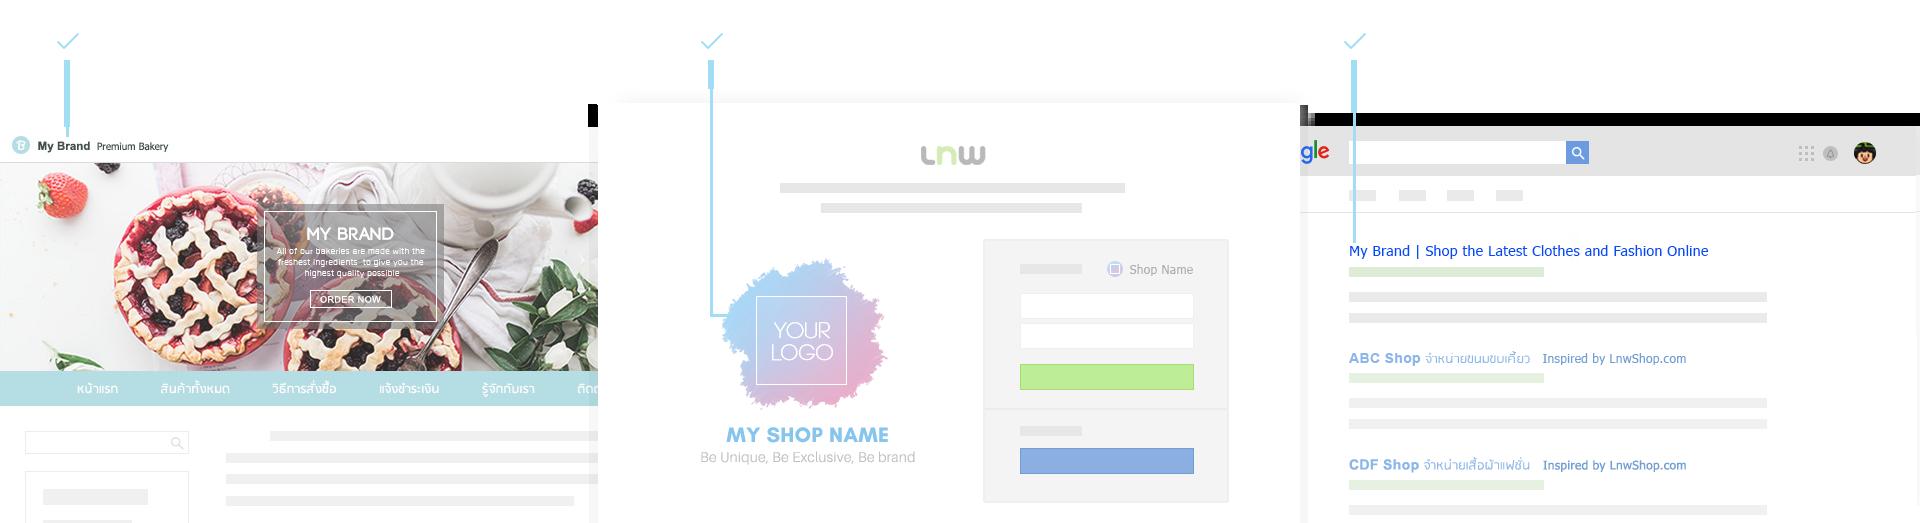 your logo & shop name on LnwBar เป็นตัวคุณได้มากกว่าที่เคย ไม่มีโลโก้ LnwShop อีกต่อไป, Your Logo & Shop name at Login Page ประตูสู่แบรนด์ เอกสิทธิ์เฉพาะคุณ มอบความรู้สึกเหมือนอยู่ที่ร้าน , No 'Inspired by LnwShop.com' in Title ดีใจจัง ค้นแบรนด์เจอเลย ให้ลูกค้าได้สัมผัสกับแรนด์ของคุณได้เต็มที่